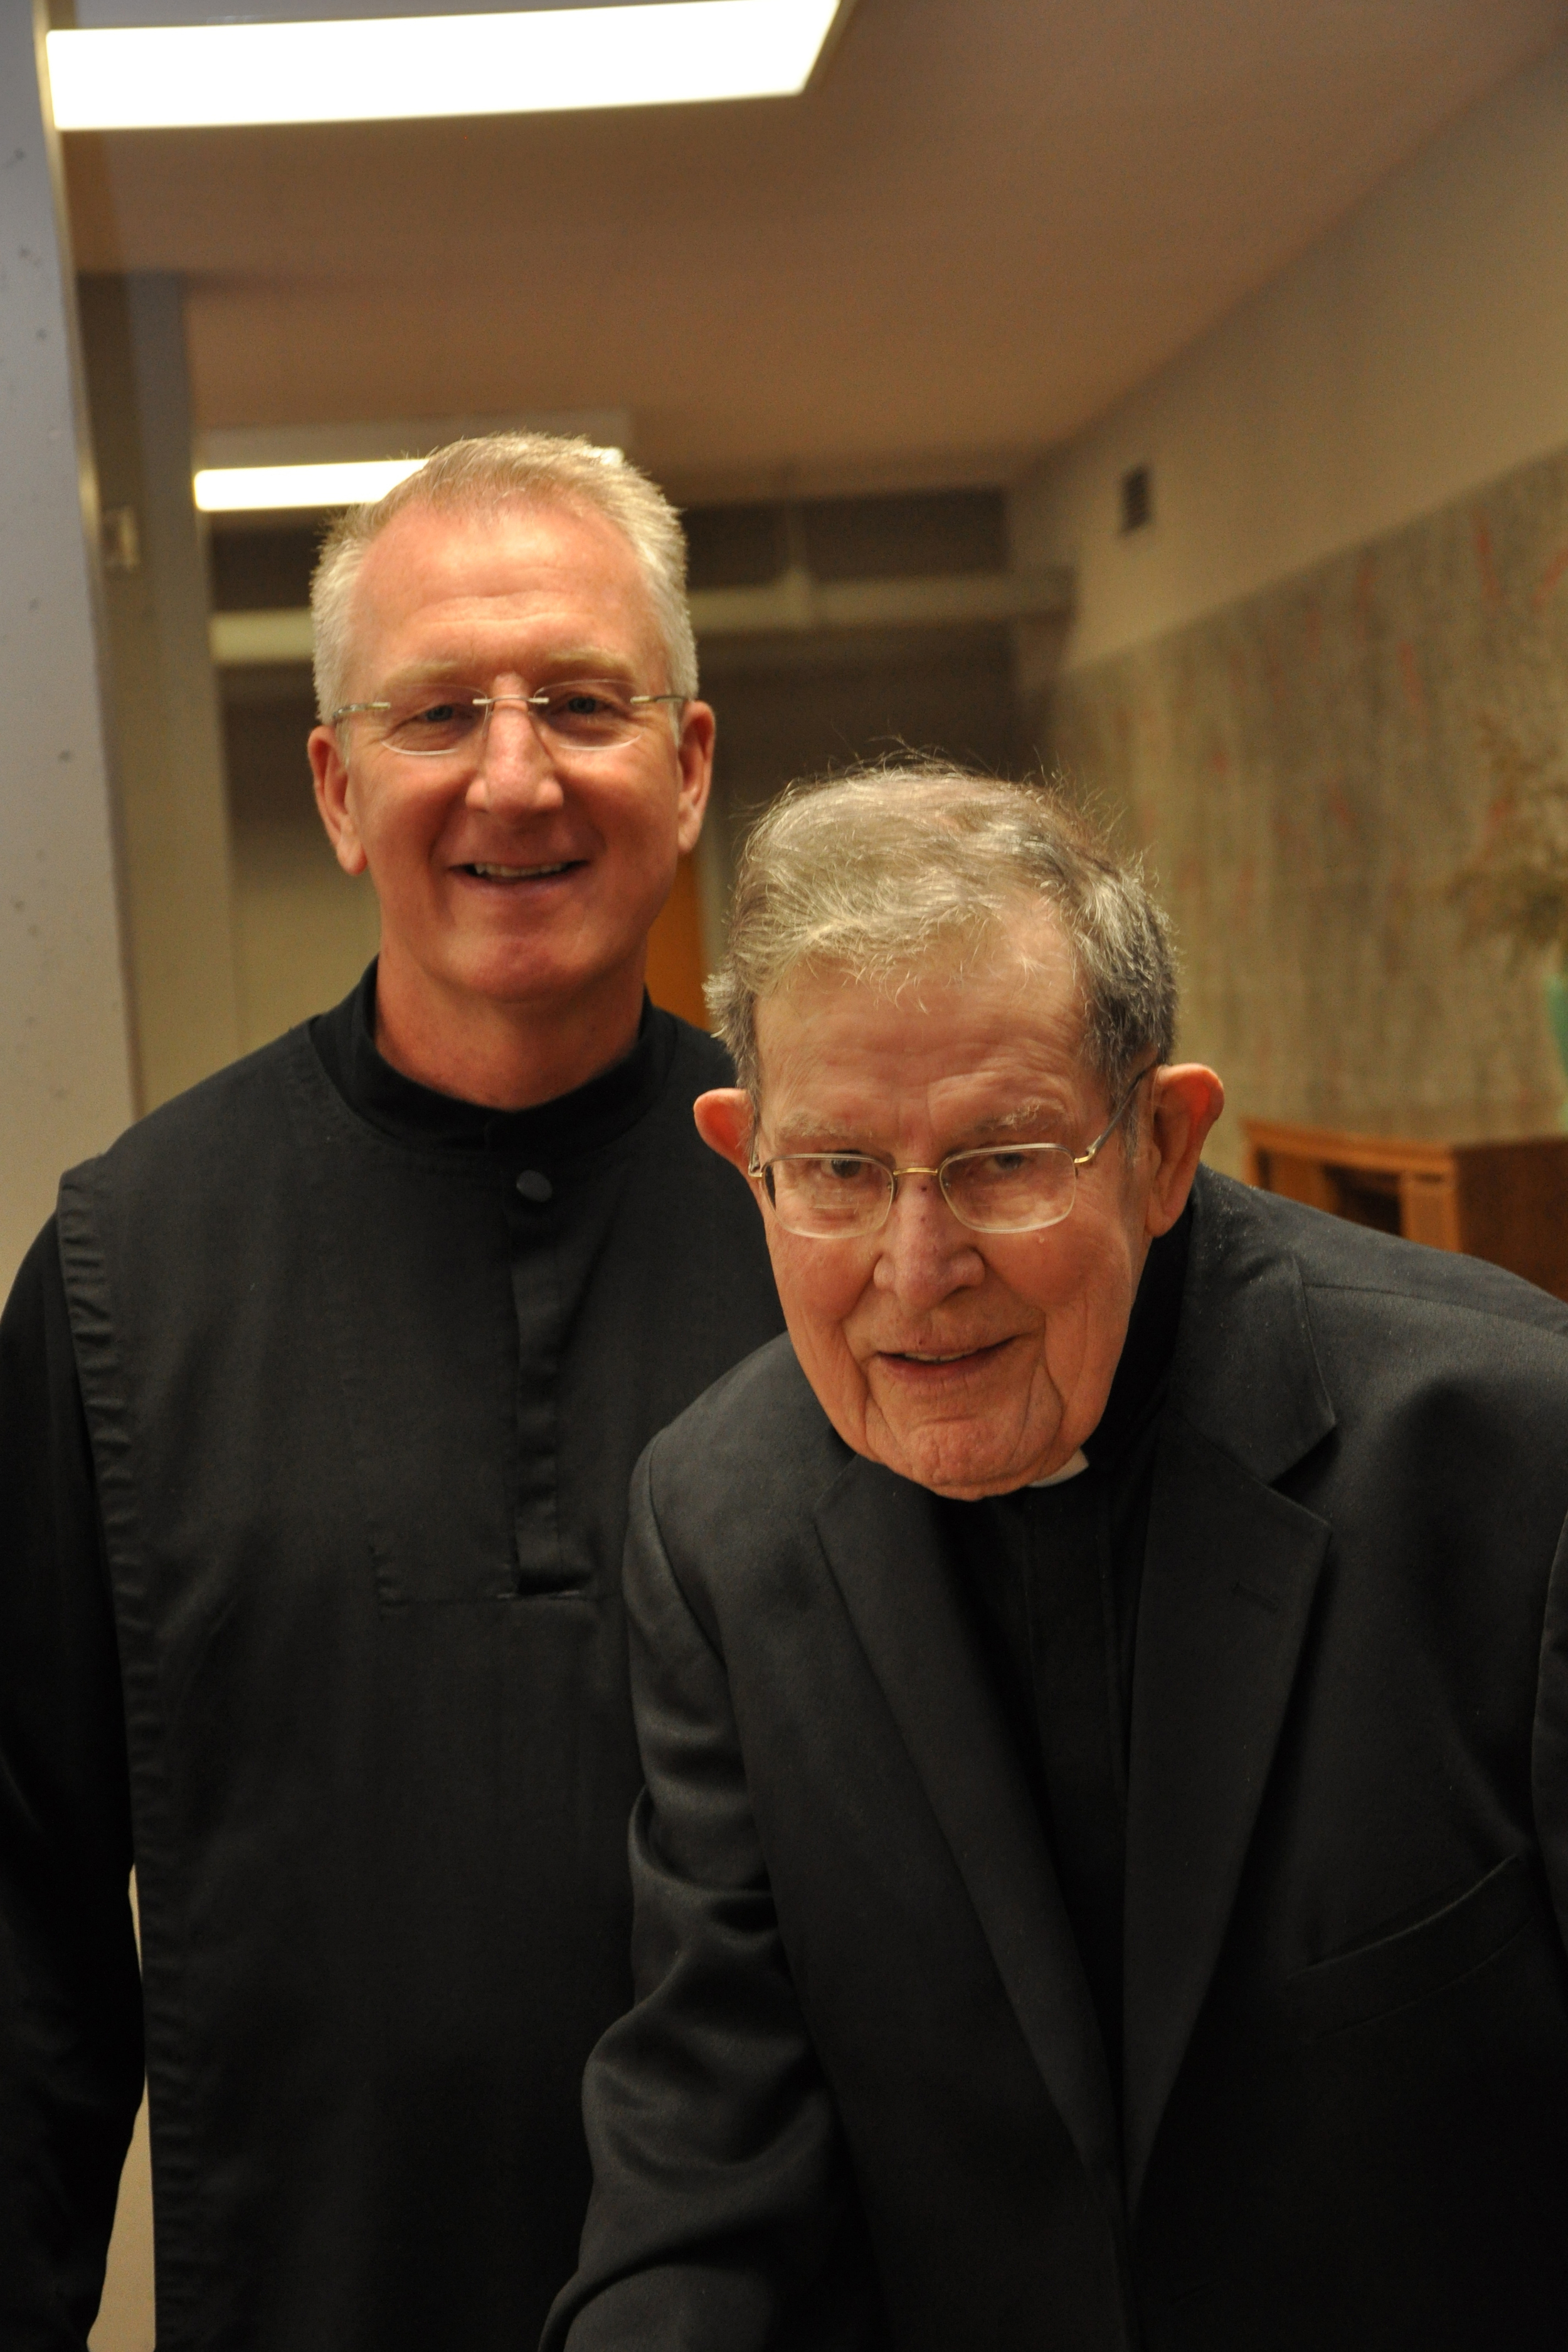 Br. Luke Turner and Fr. Bertrand.